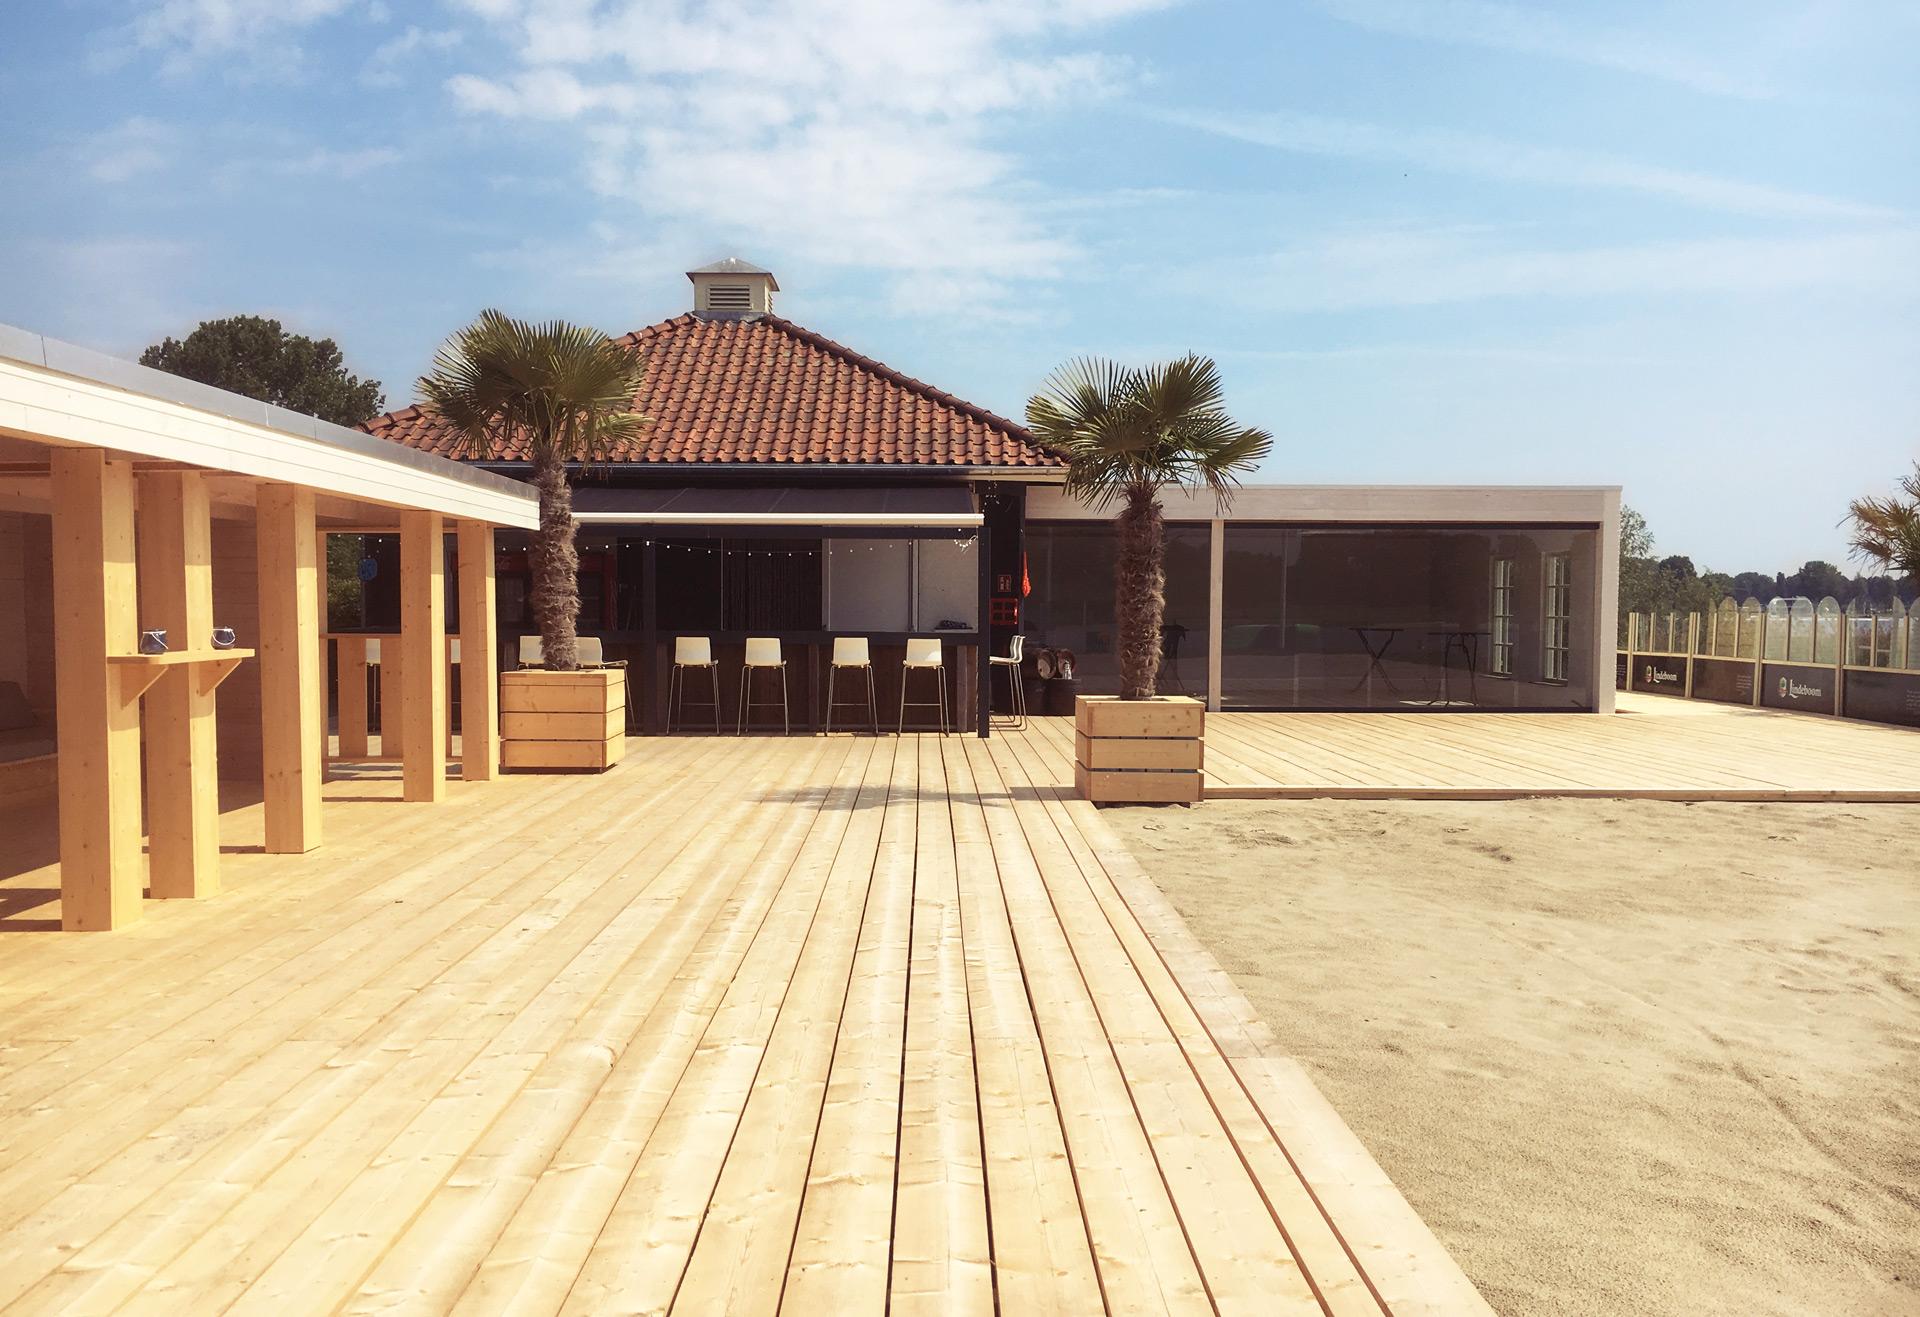 Area-X-De-Weerd-Roermond-Beachclub-Palm-Beach-2b